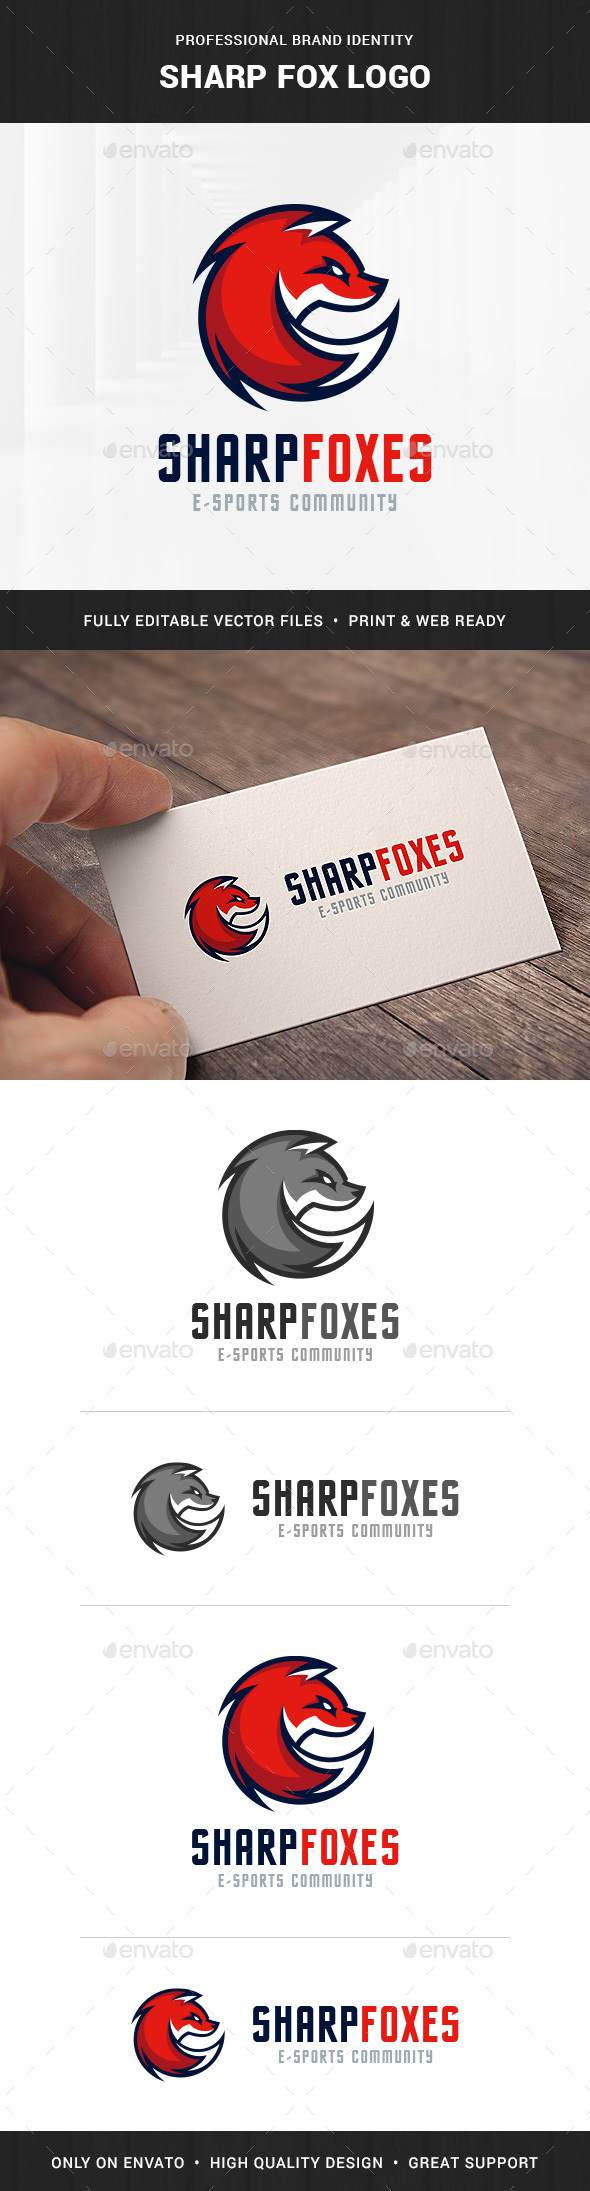 Sharp Fox Logo Template - Animals Logo Templates